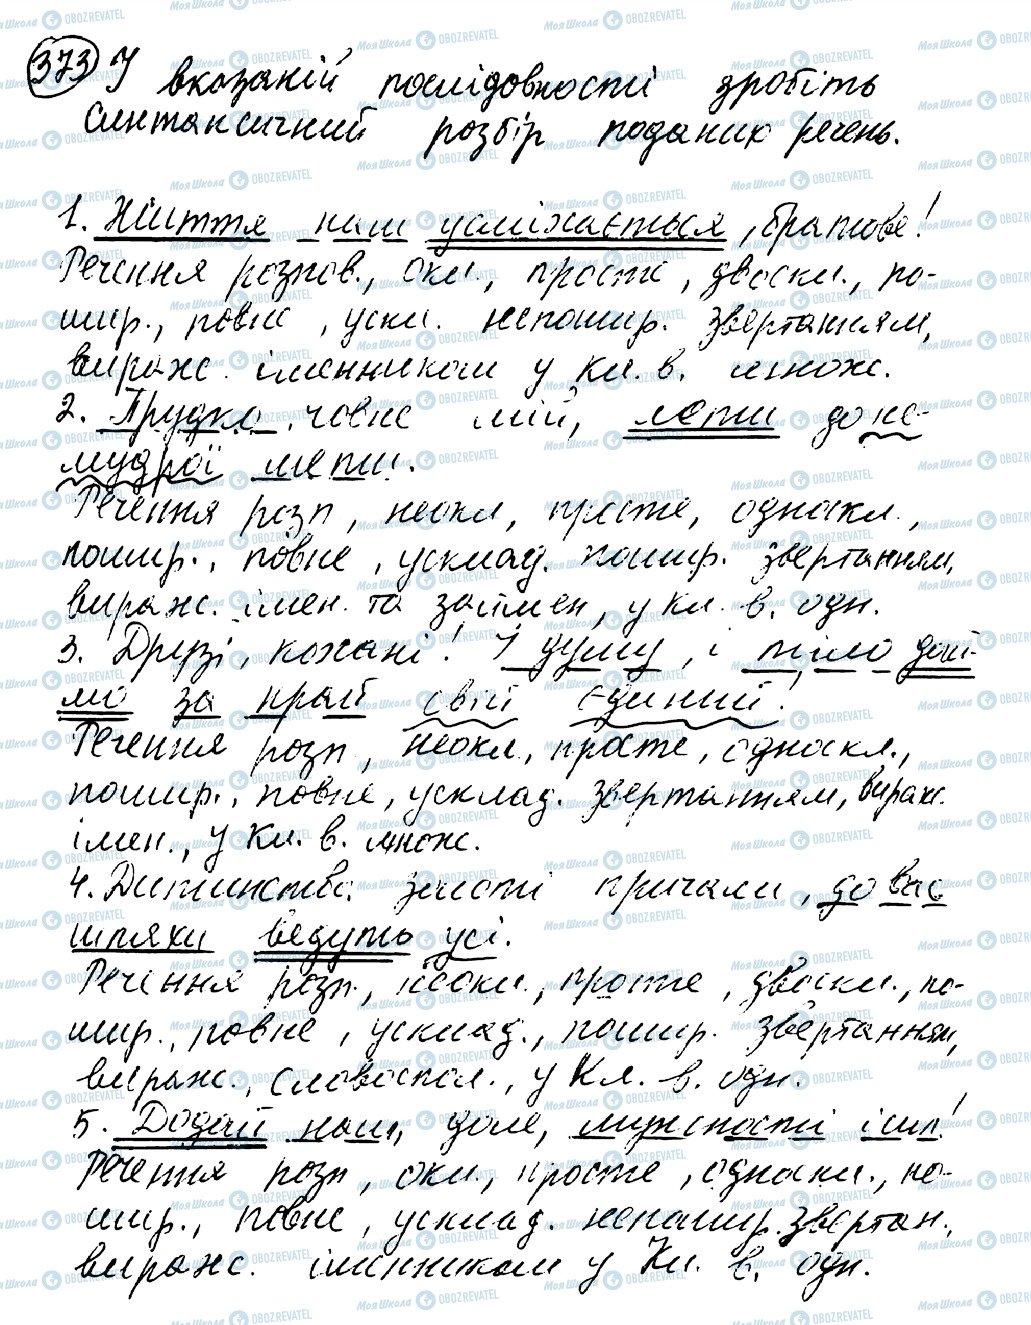 ГДЗ Укр мова 8 класс страница 373